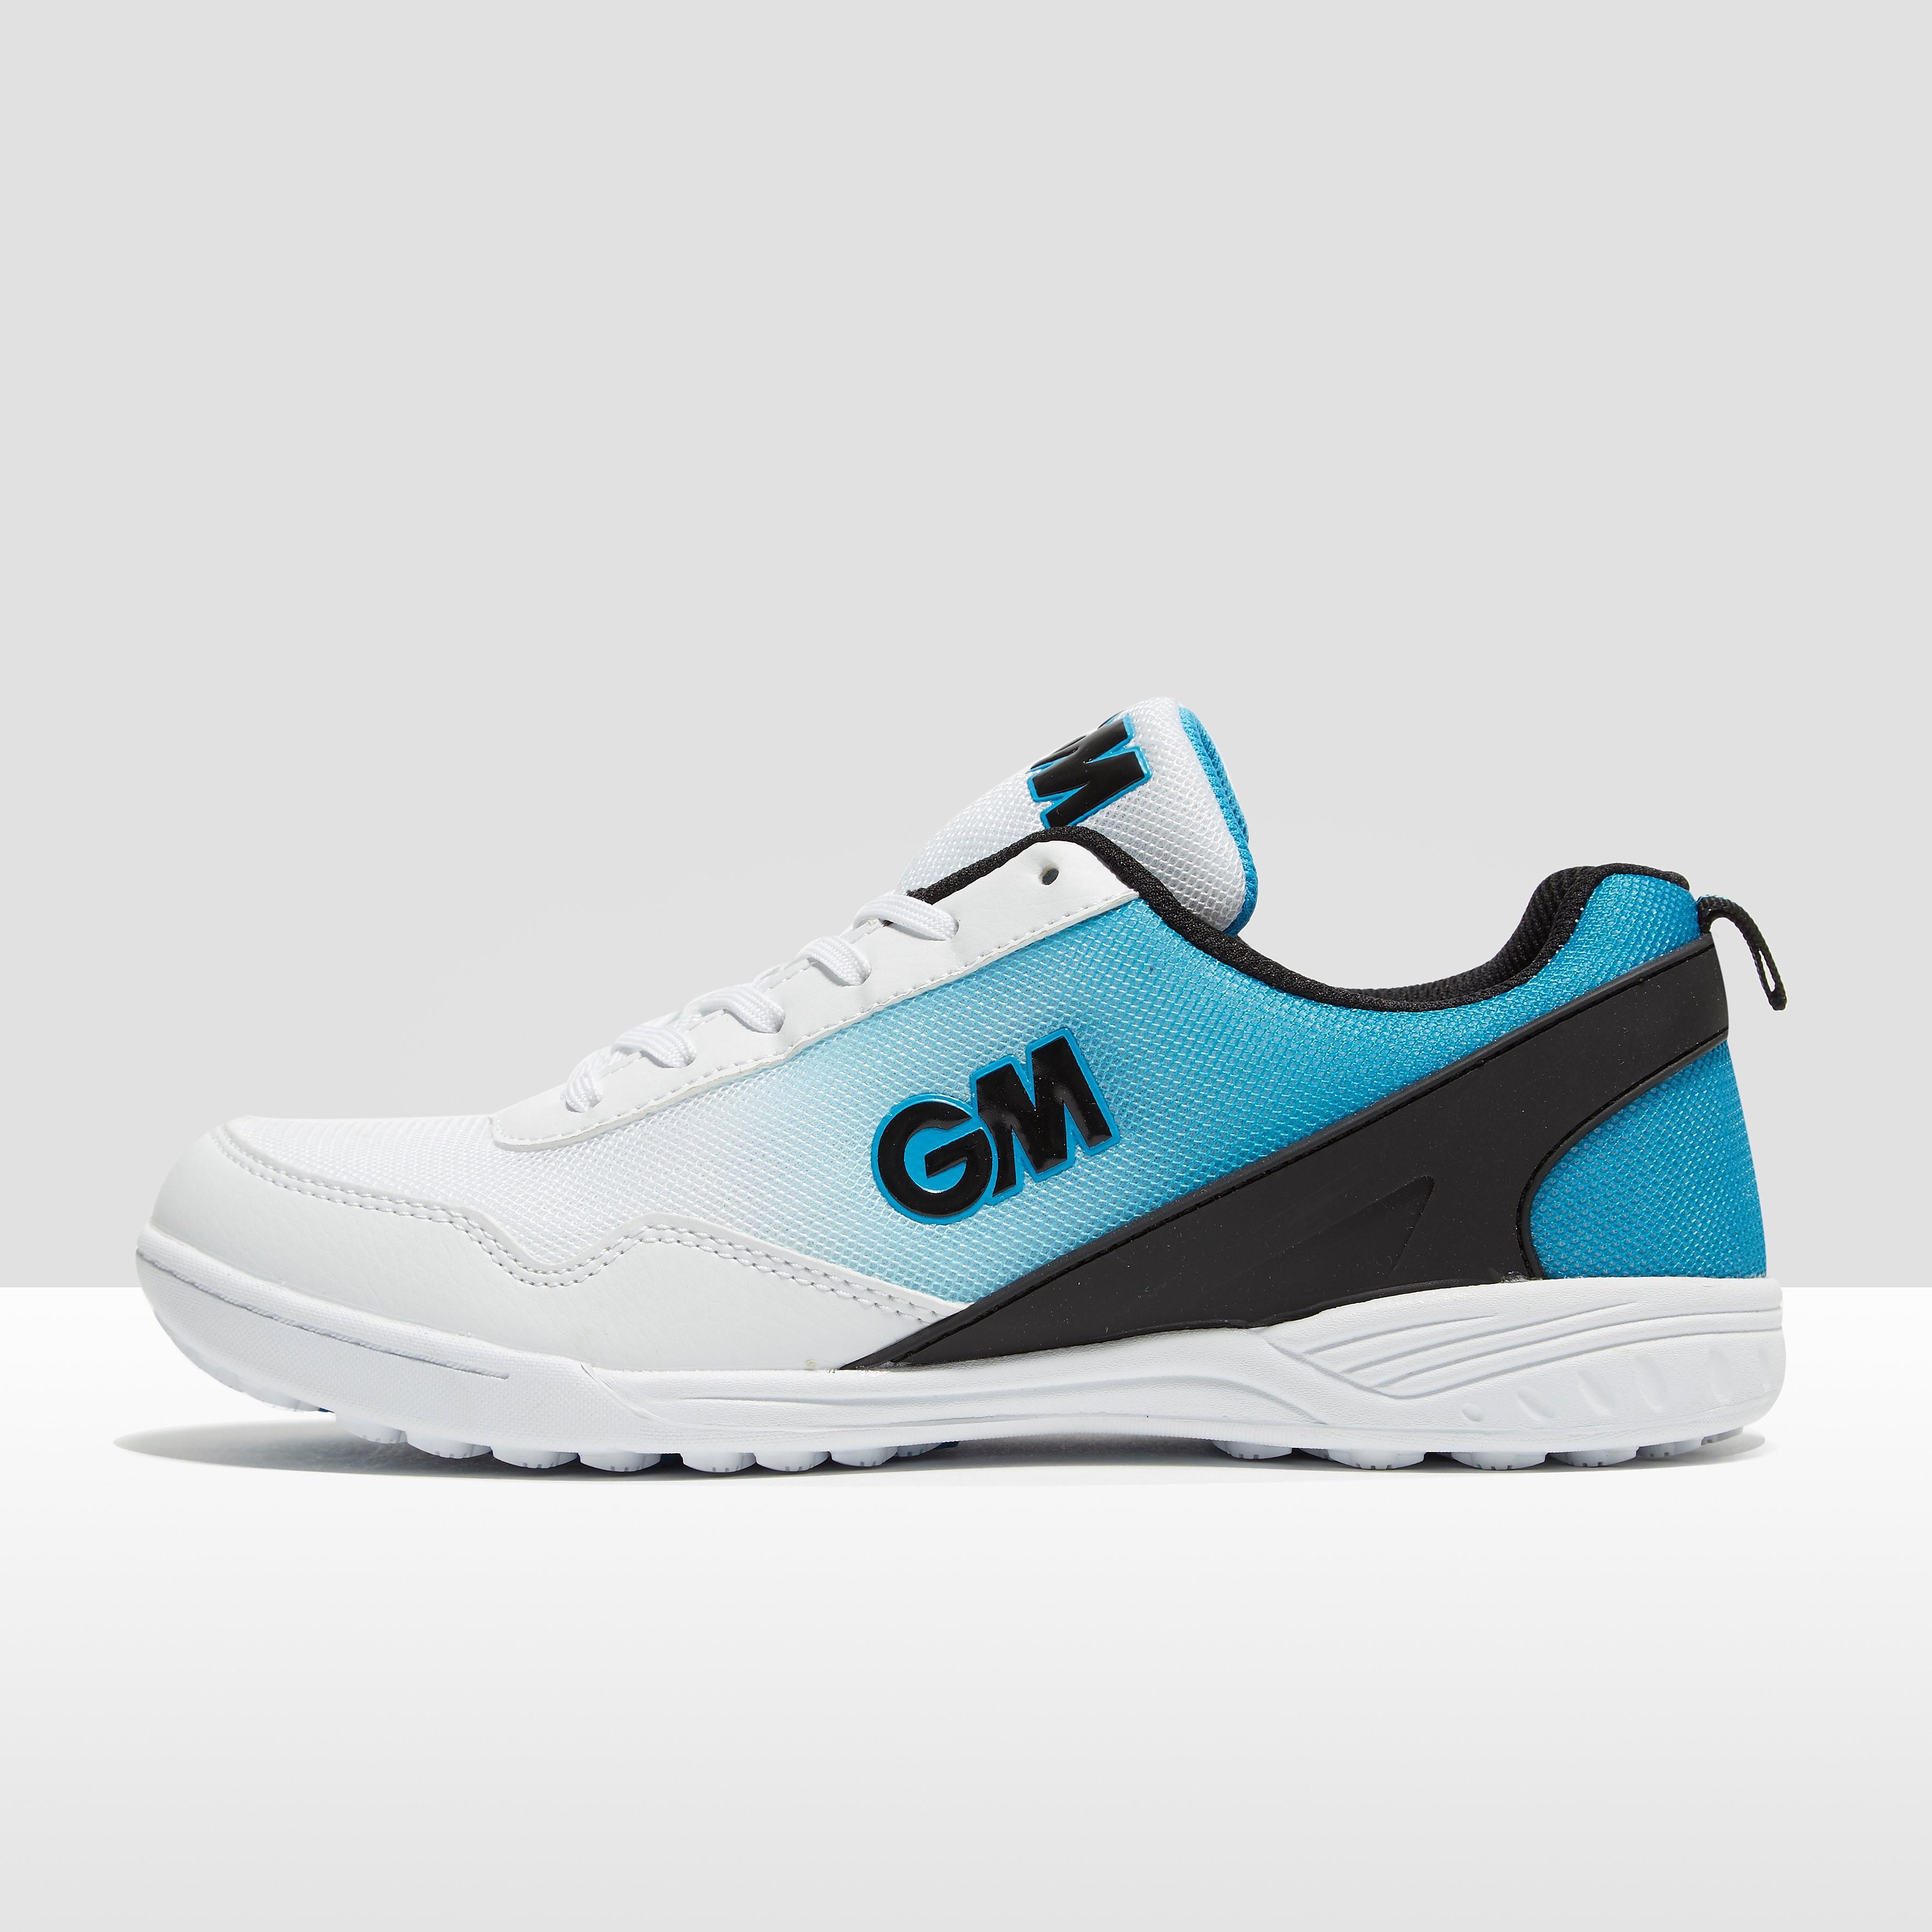 Gunn & Moore Mogul Junior Cricket Shoes